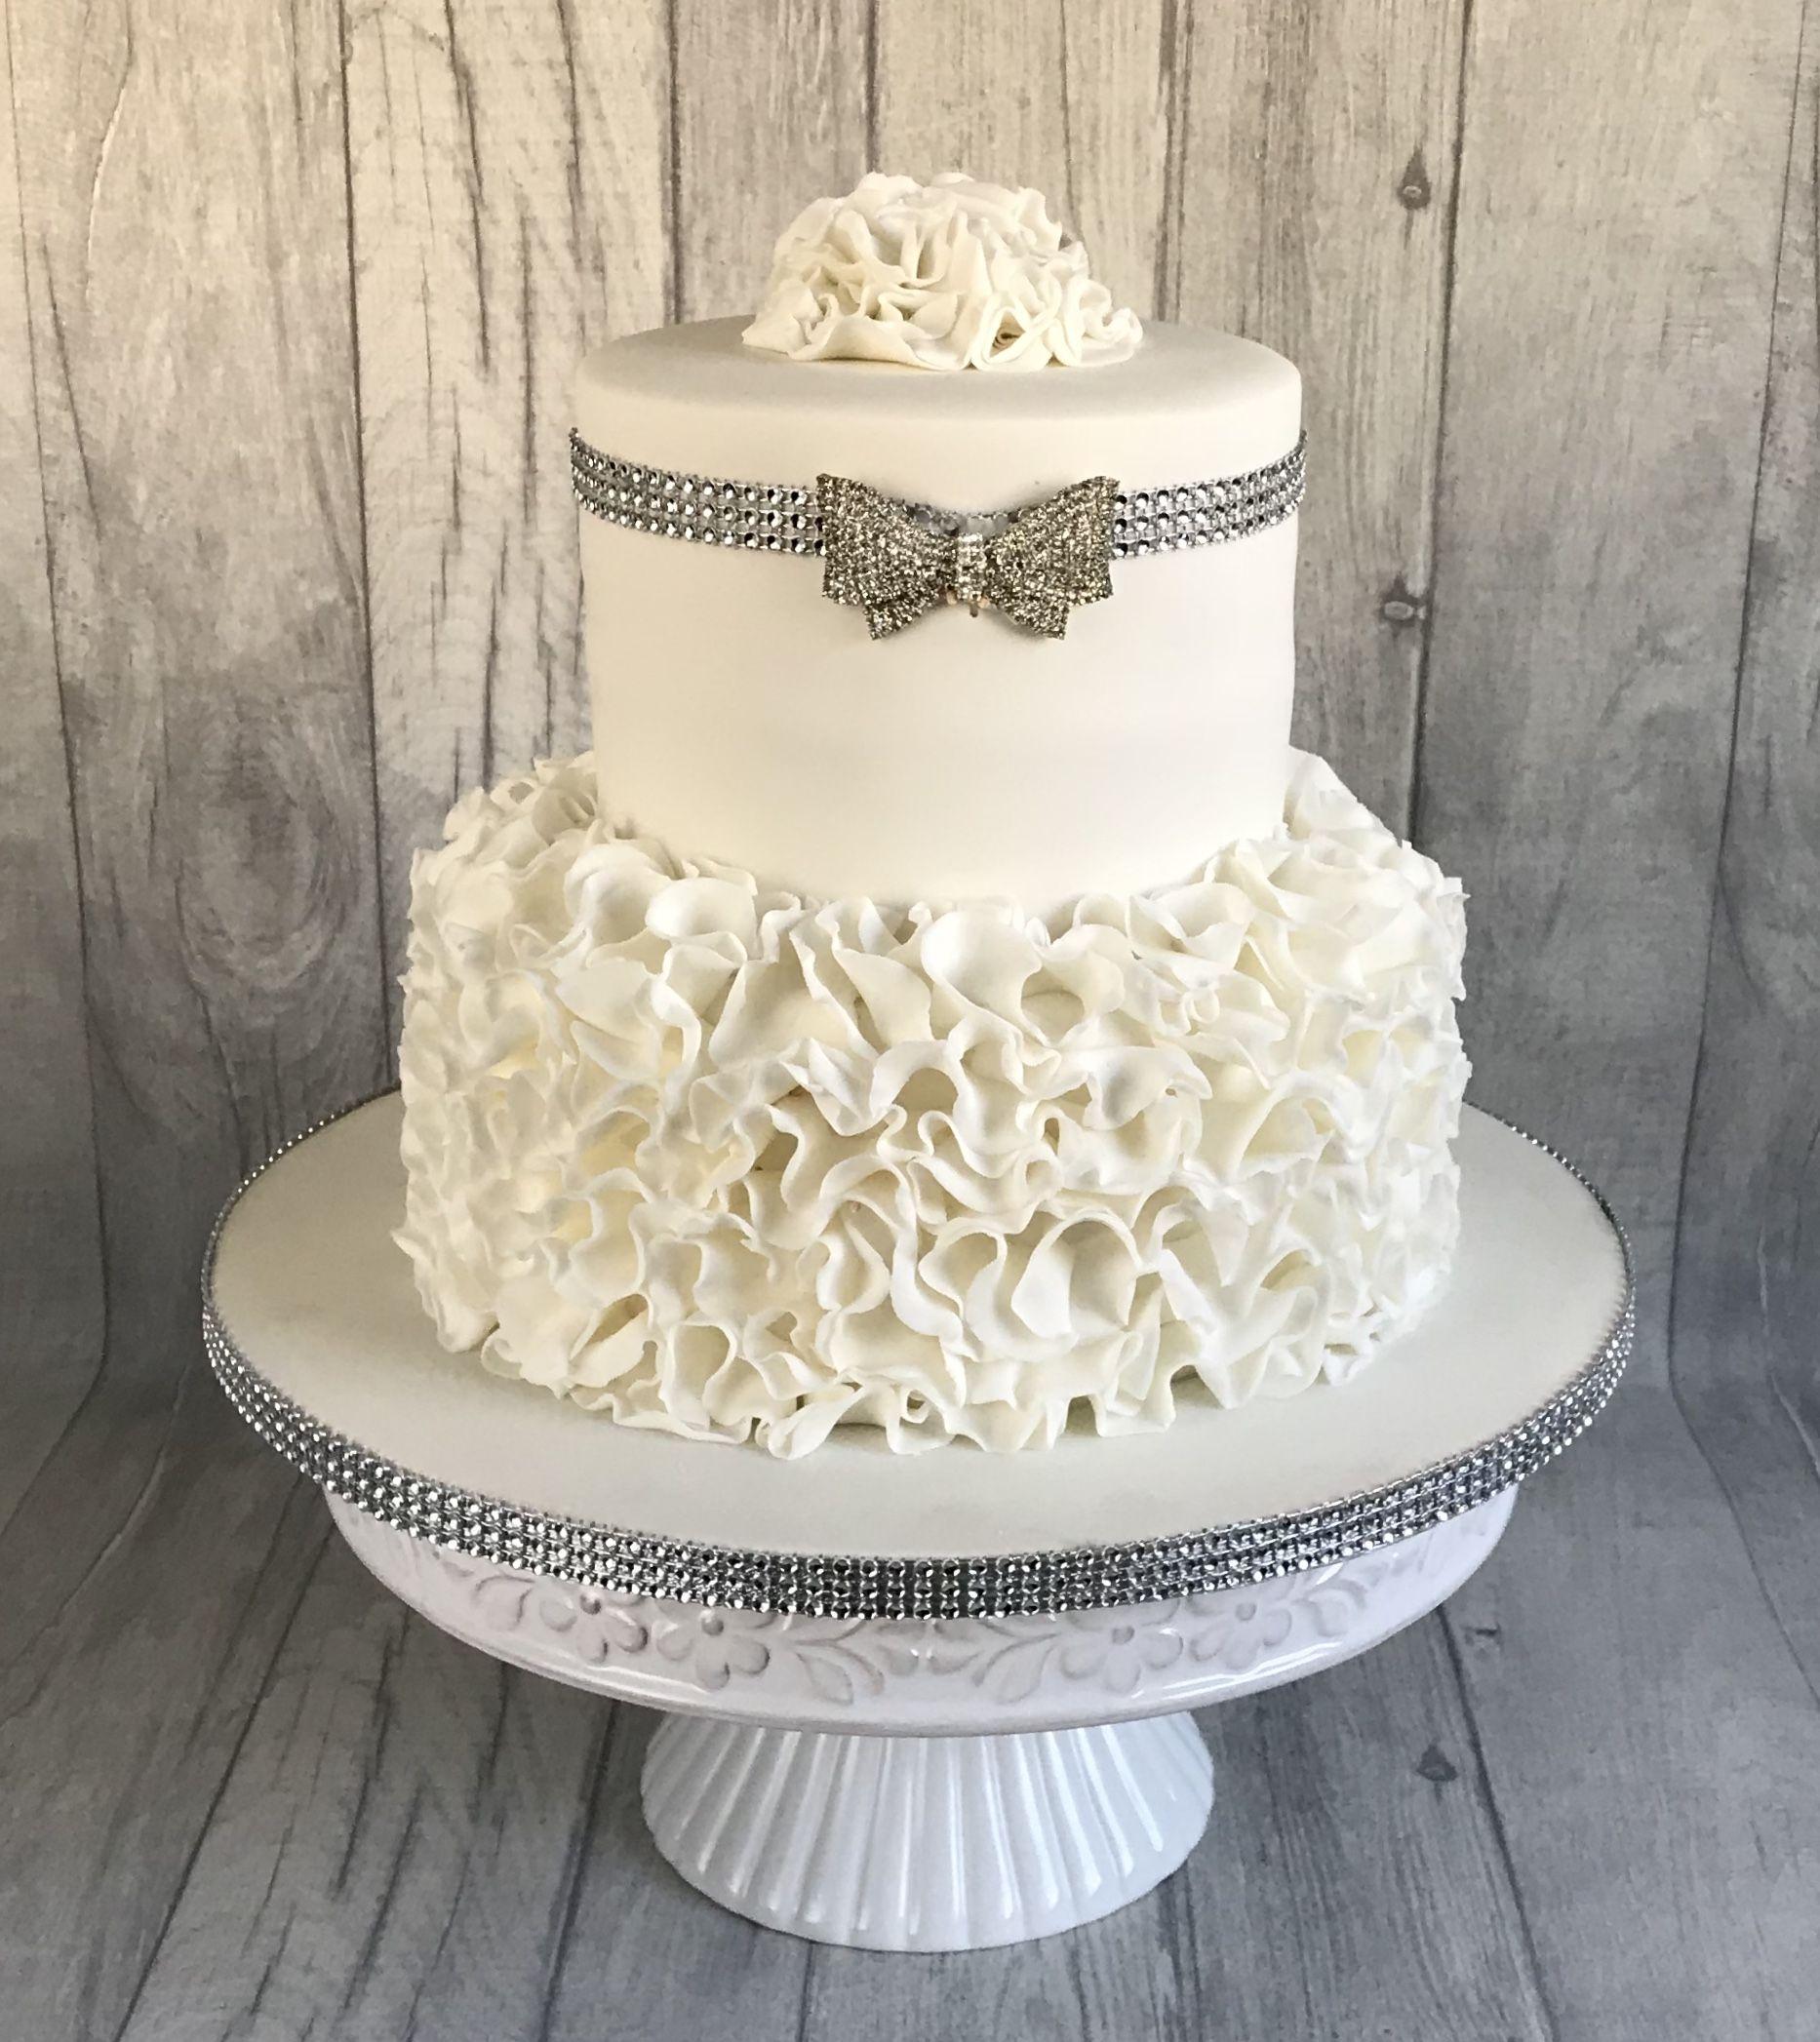 Diamond wedding anniversary cake | pastalar ve dugunler | Pinterest ...